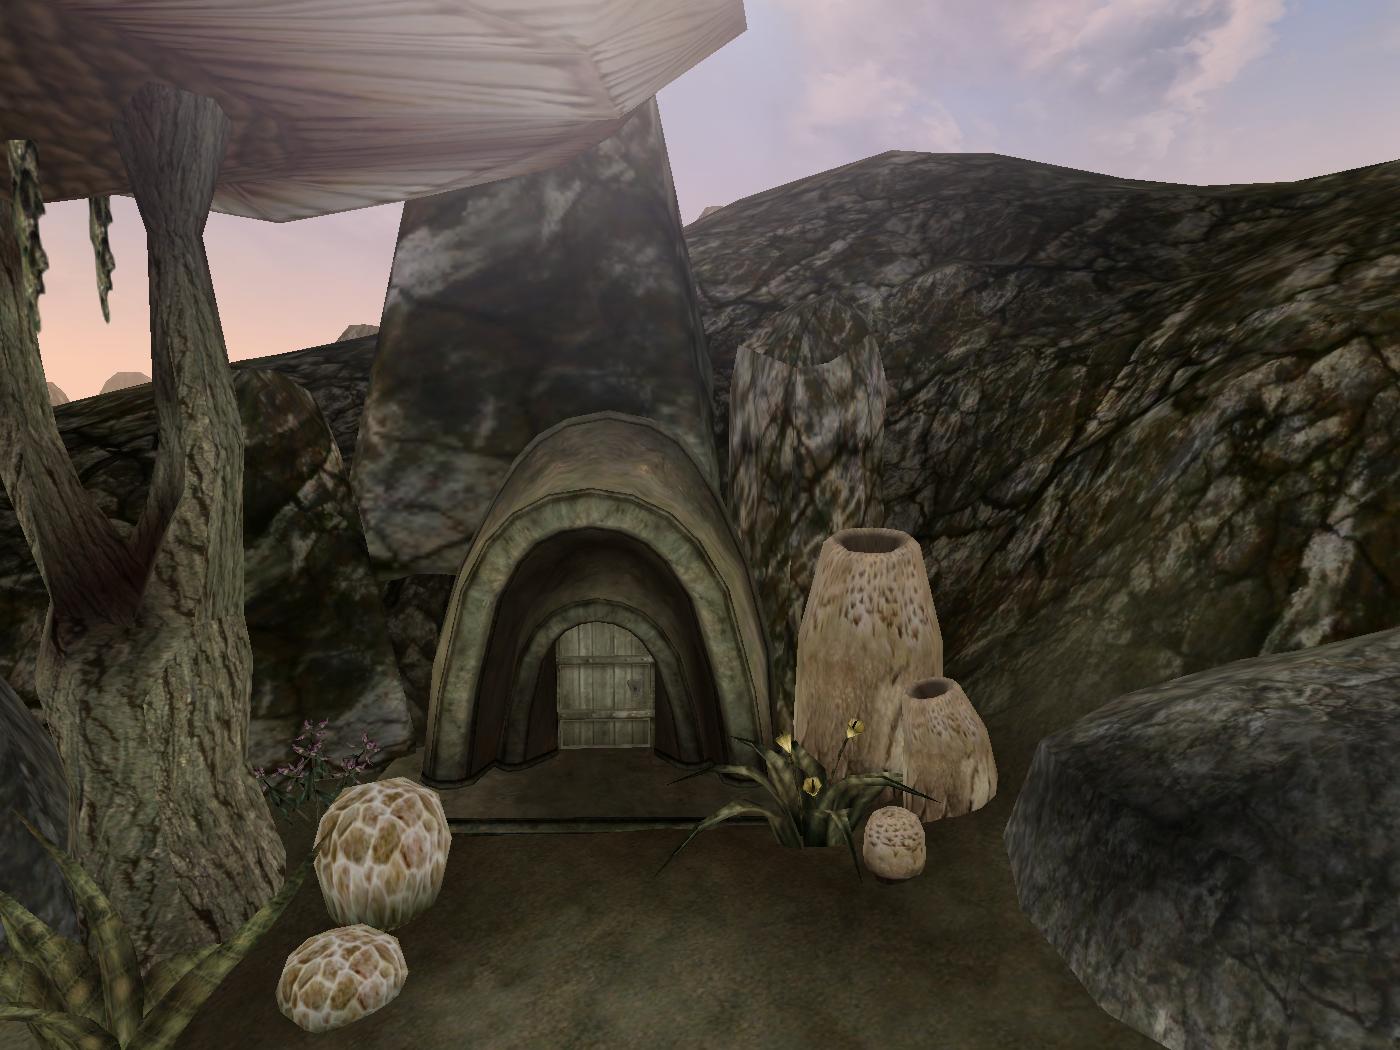 Verelnim Ancestral Tomb (Morrowind)